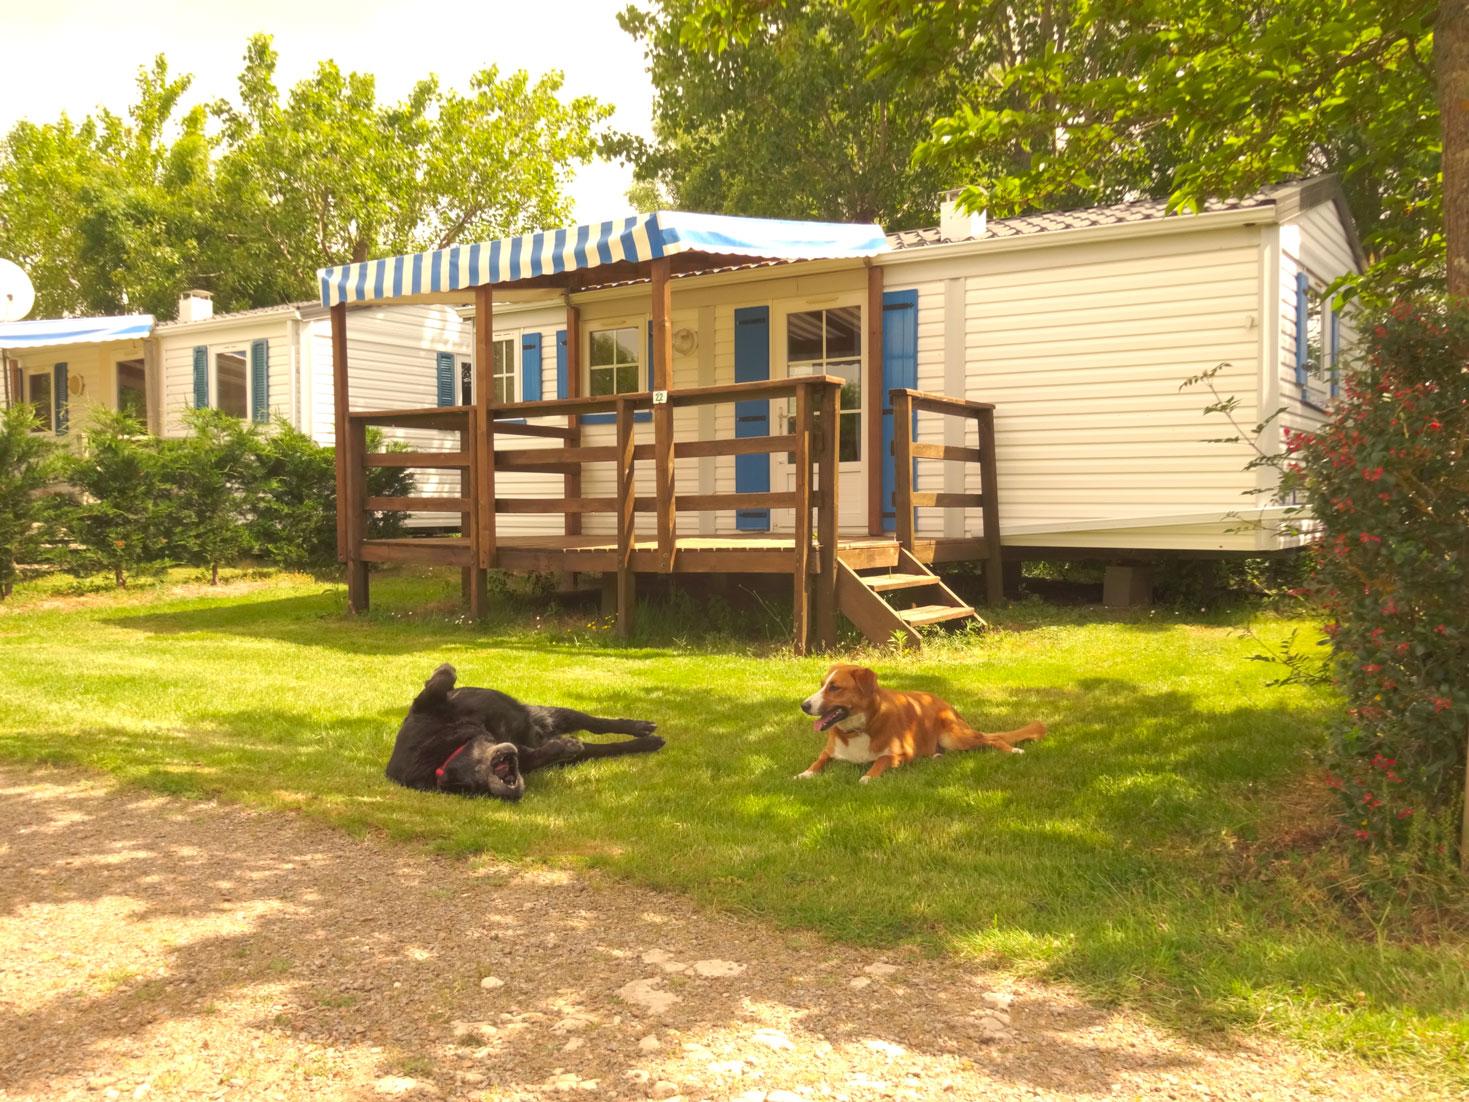 galerie-photos-mobil-home-camping-3-etoiles-vendee-le-port-de-moricq